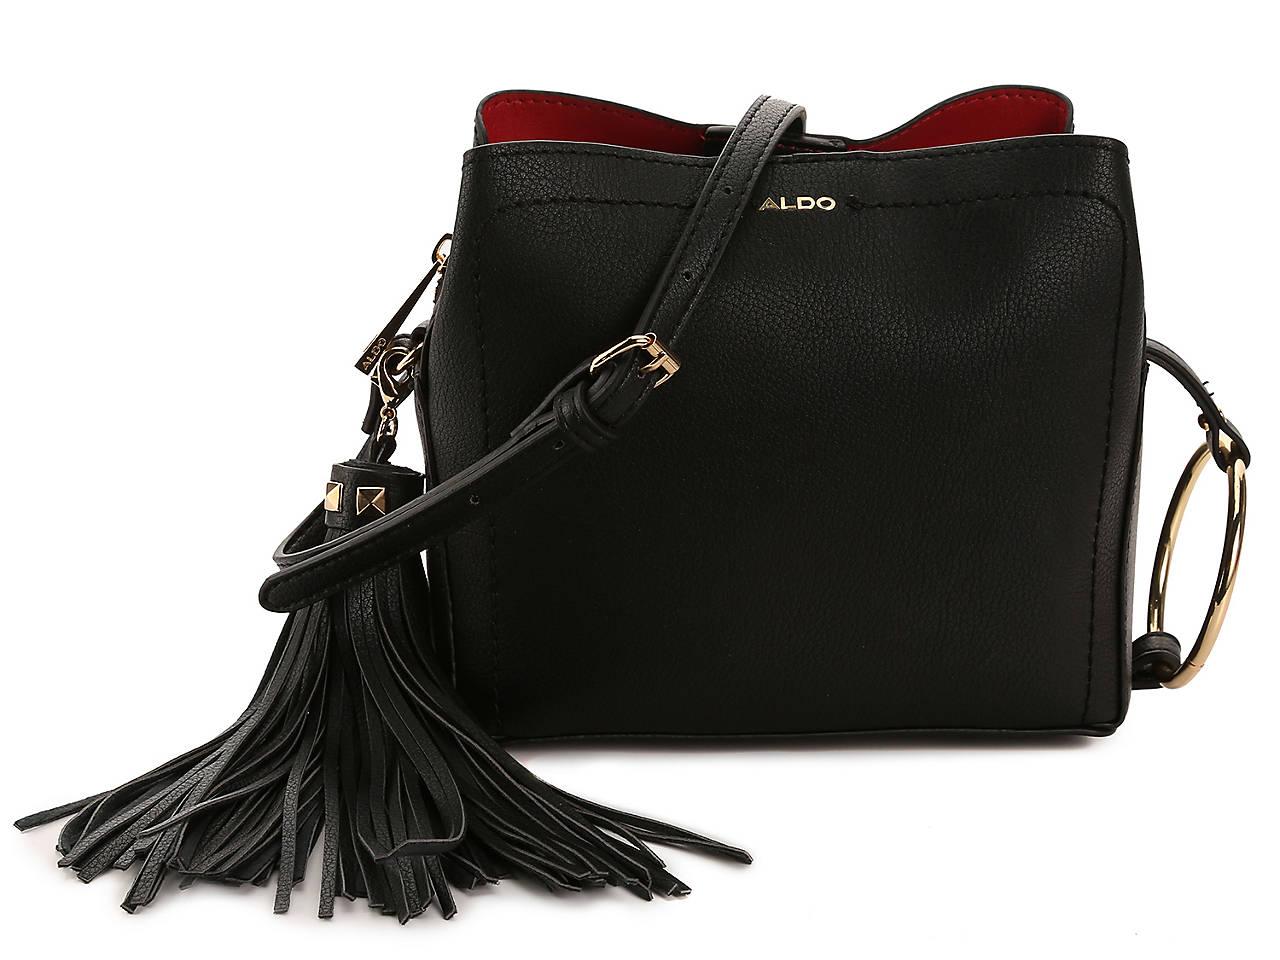 605d2fc24c5 Aldo Approvisora Crossbody Bag Women s Handbags   Accessories